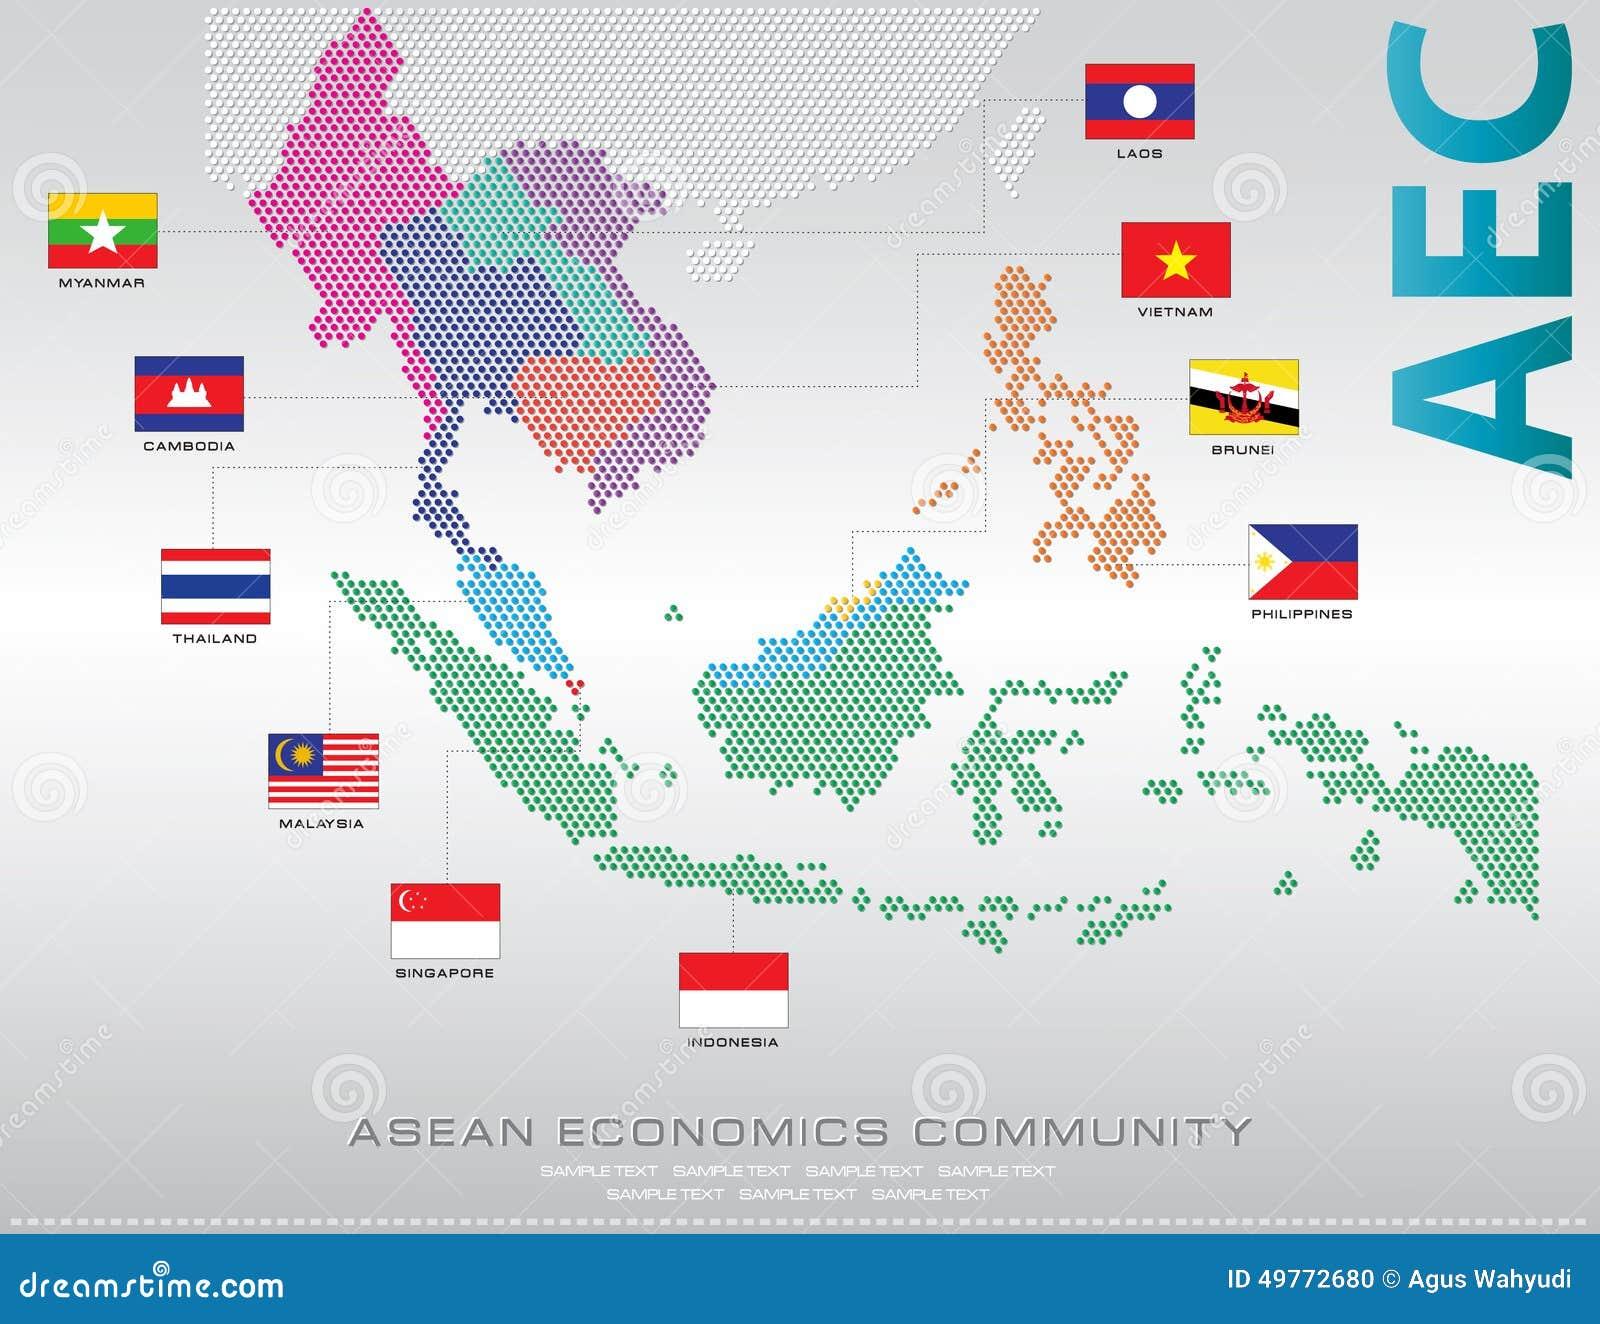 Cambodia Braces Itself for Asean Free Trade